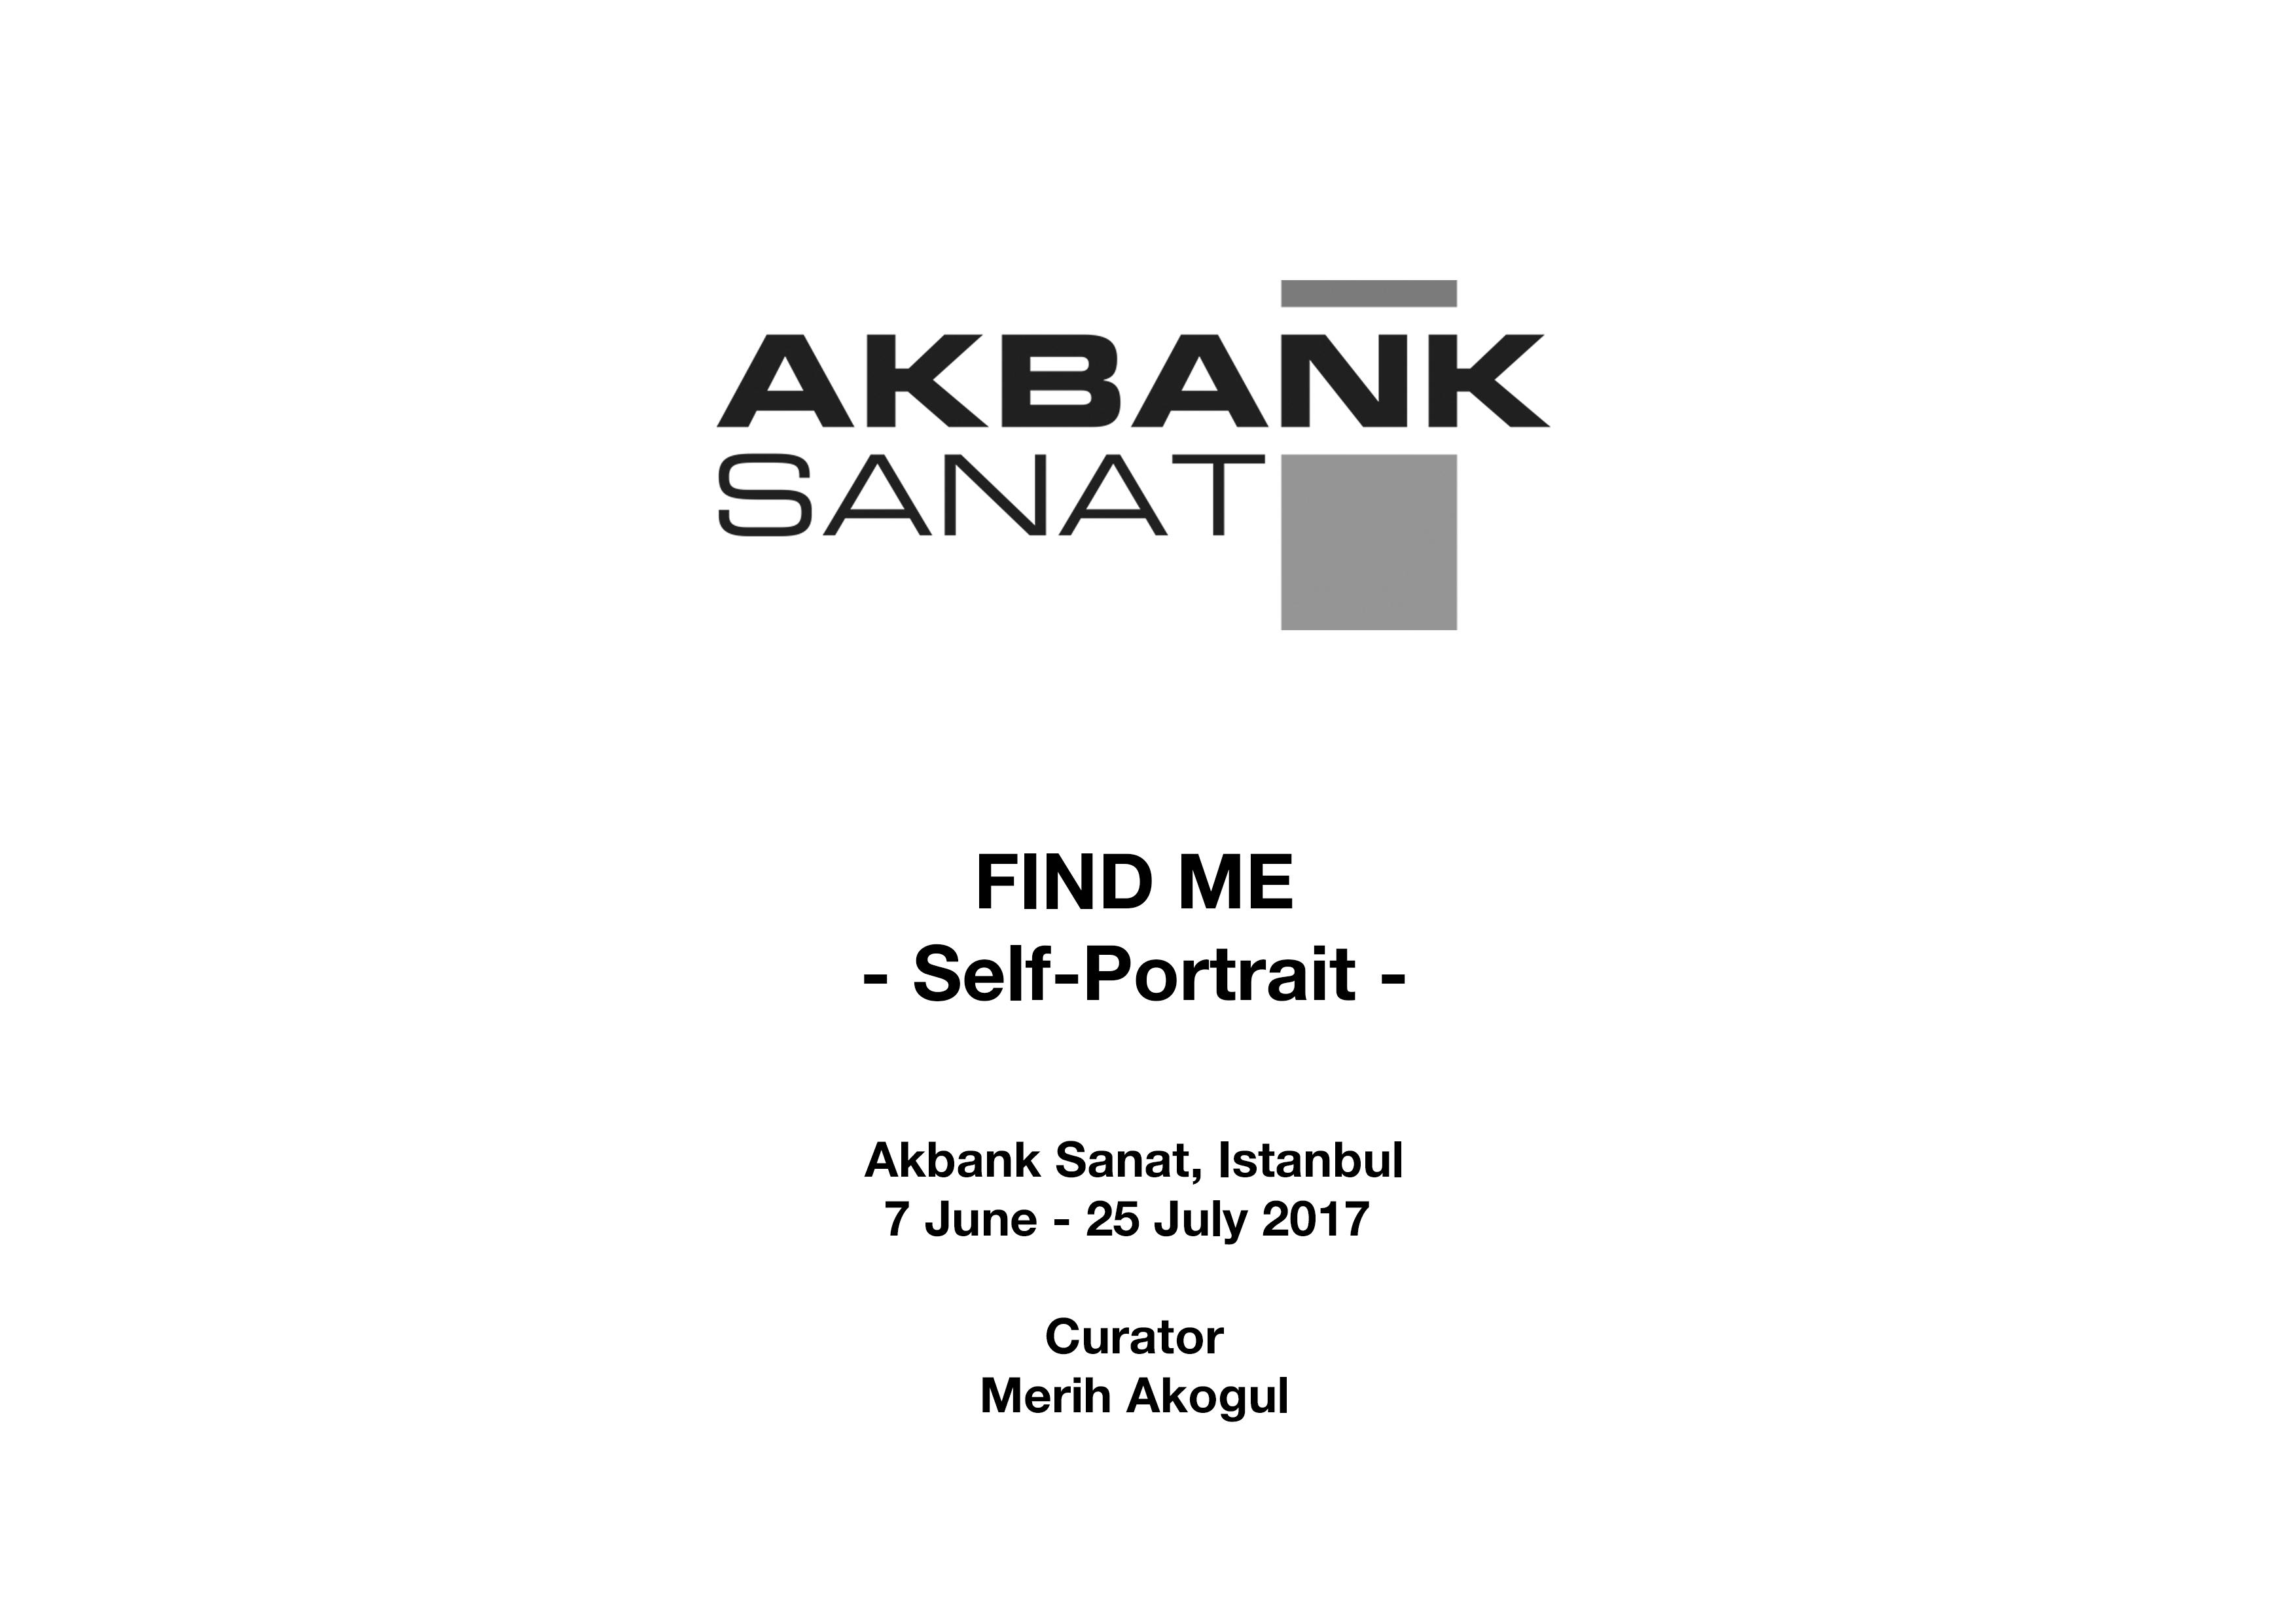 AKBANK SANAT - FIND ME